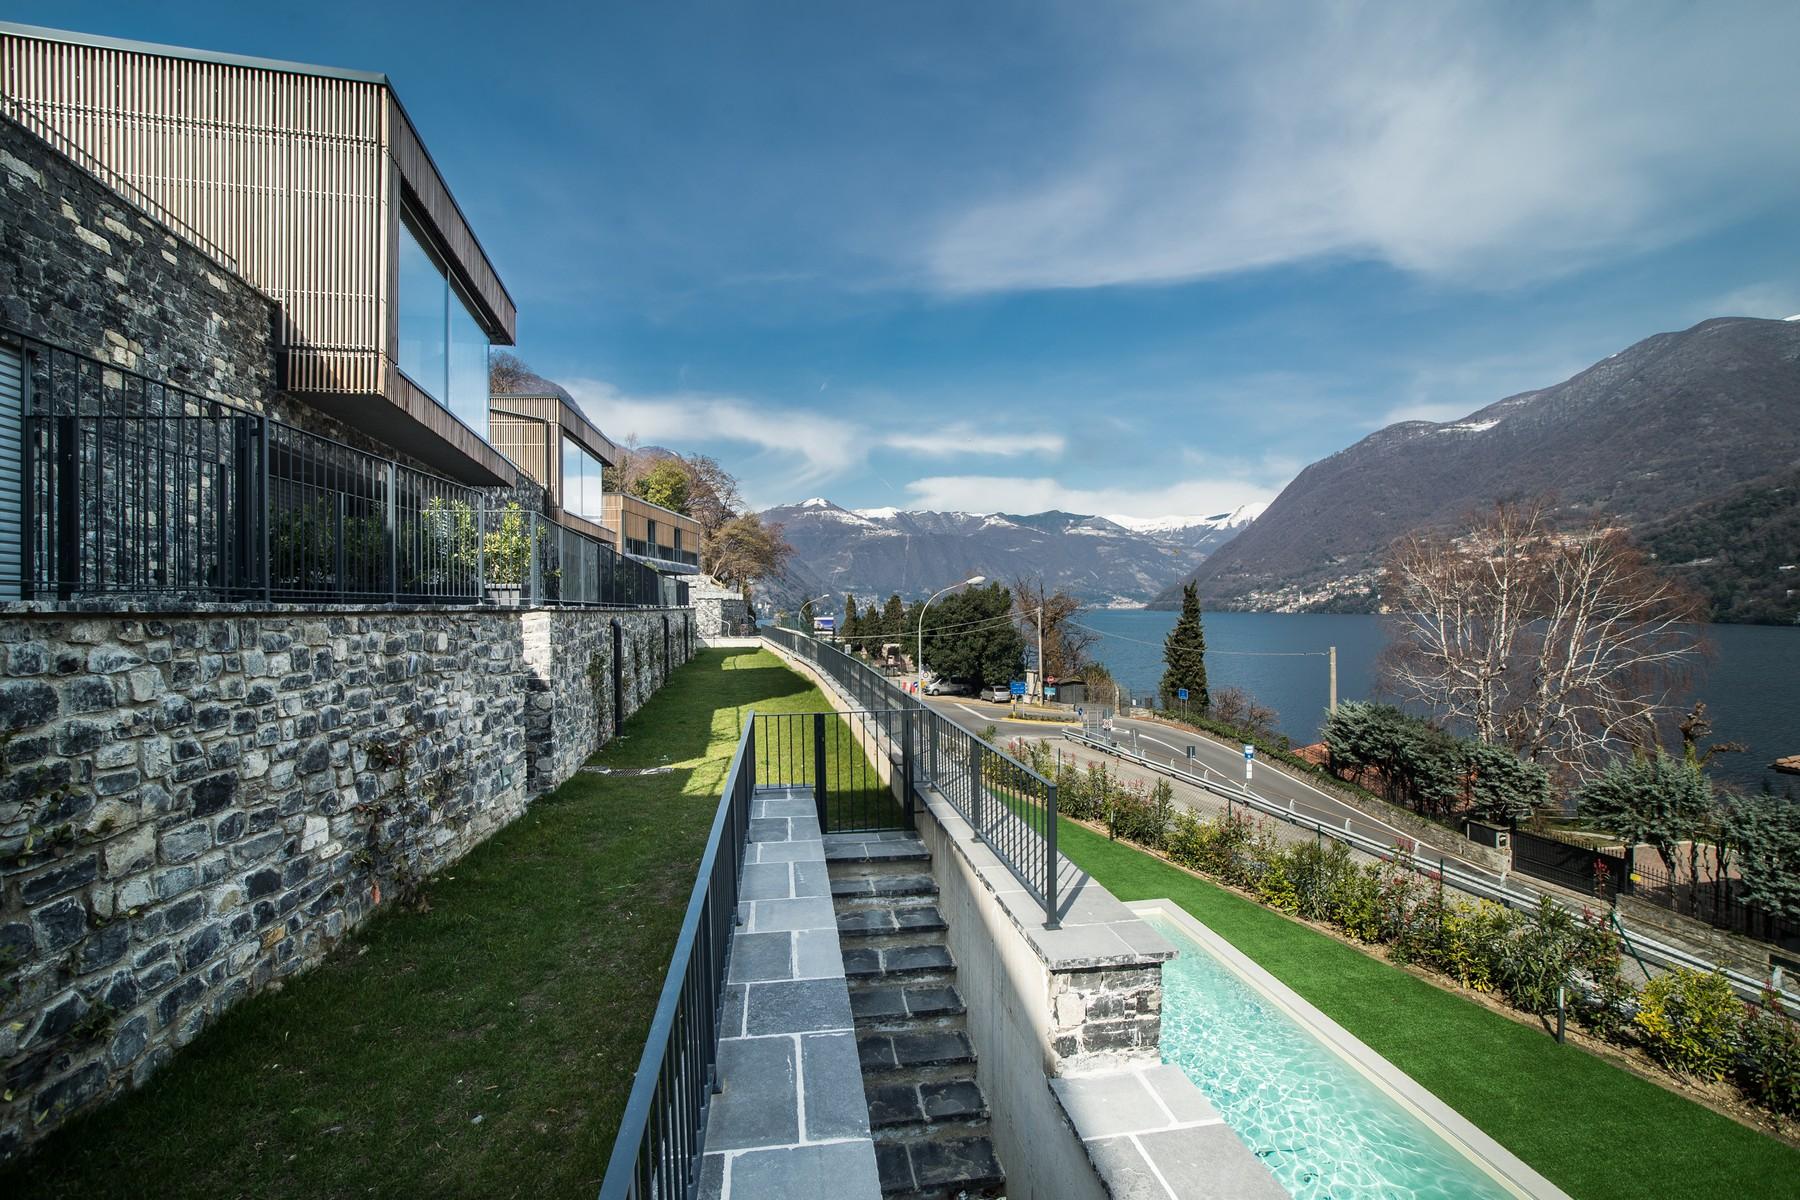 Additional photo for property listing at Prestigious modern villa with private swimming pool and magnificent Lake views Laglio Laglio, Como 22010 Italien